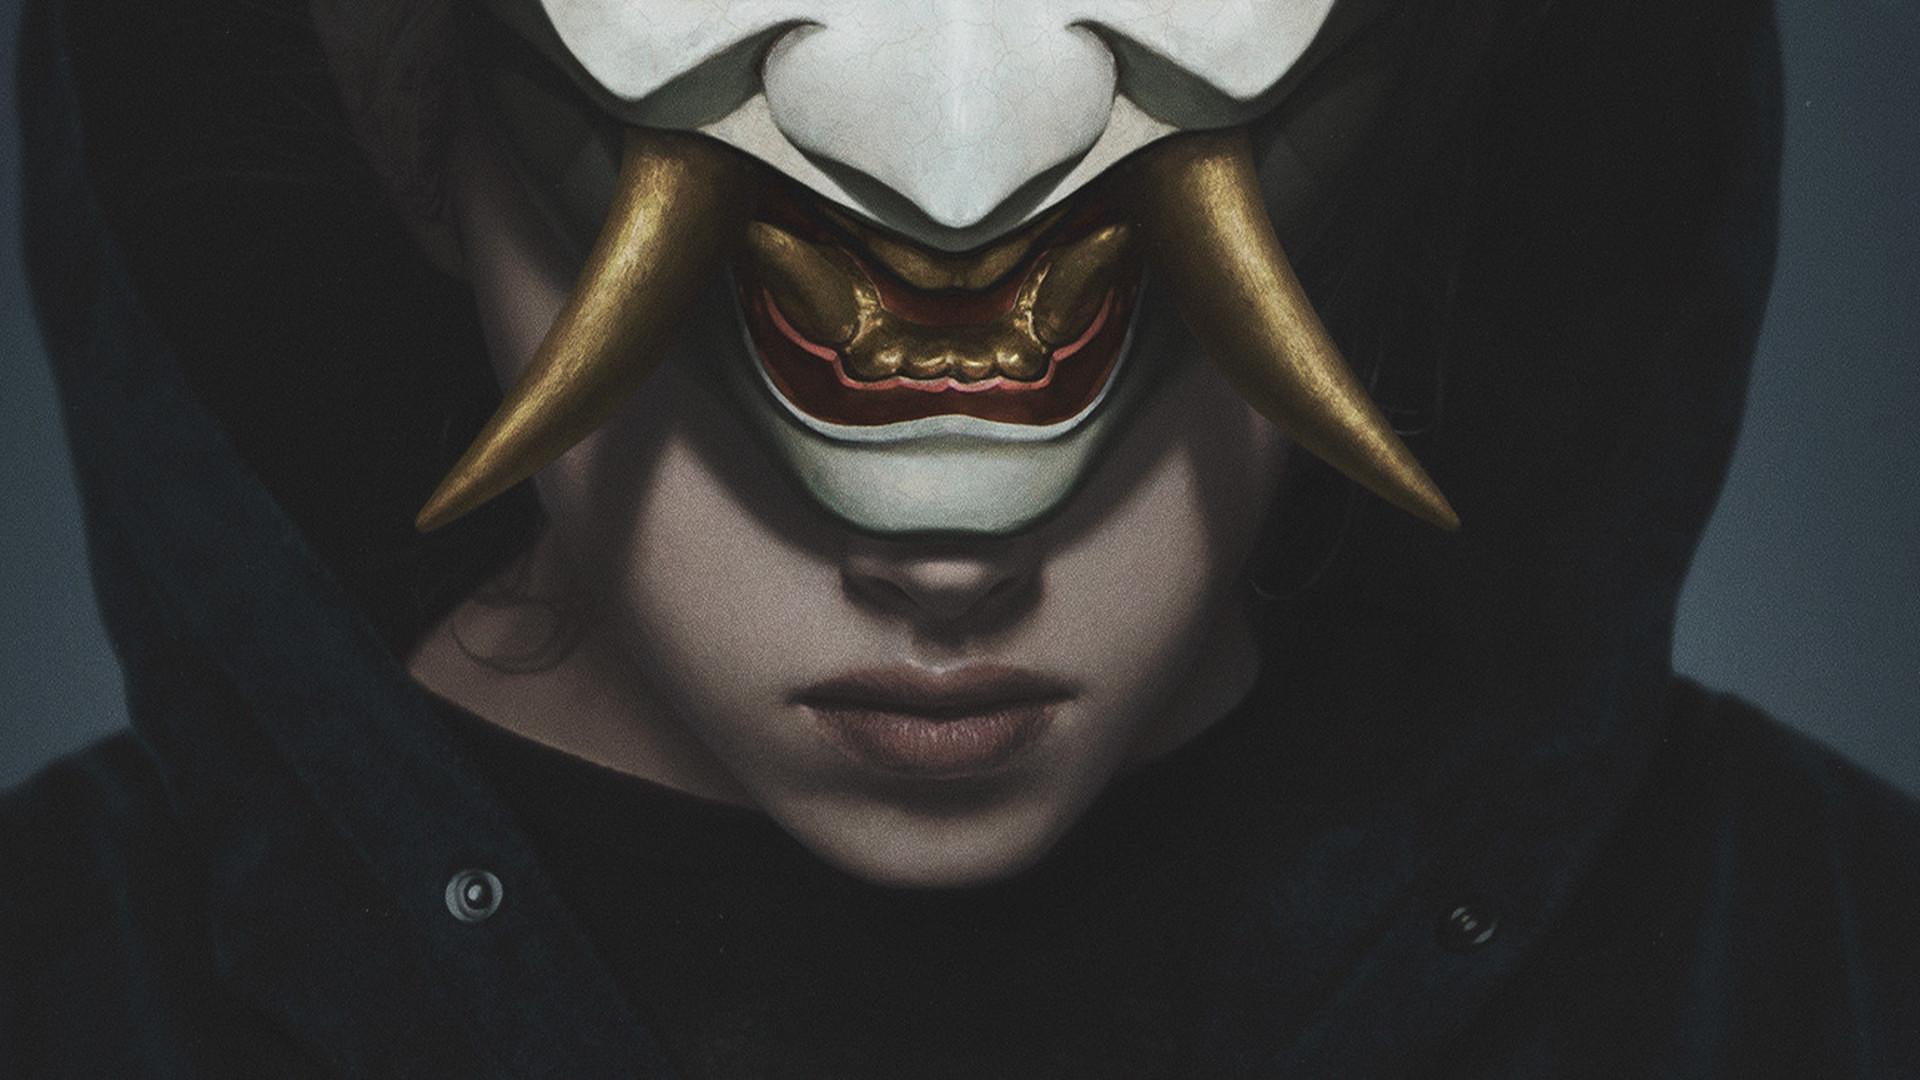 Wallpaper Digital Art Women Oni Mask 1920x1080 Ycf83 1535123 Hd Wallpapers Wallhere Blizzard entertainment, overwatch, hanzo (overwatch), hanzo shimada. women oni mask 1920x1080 ycf83